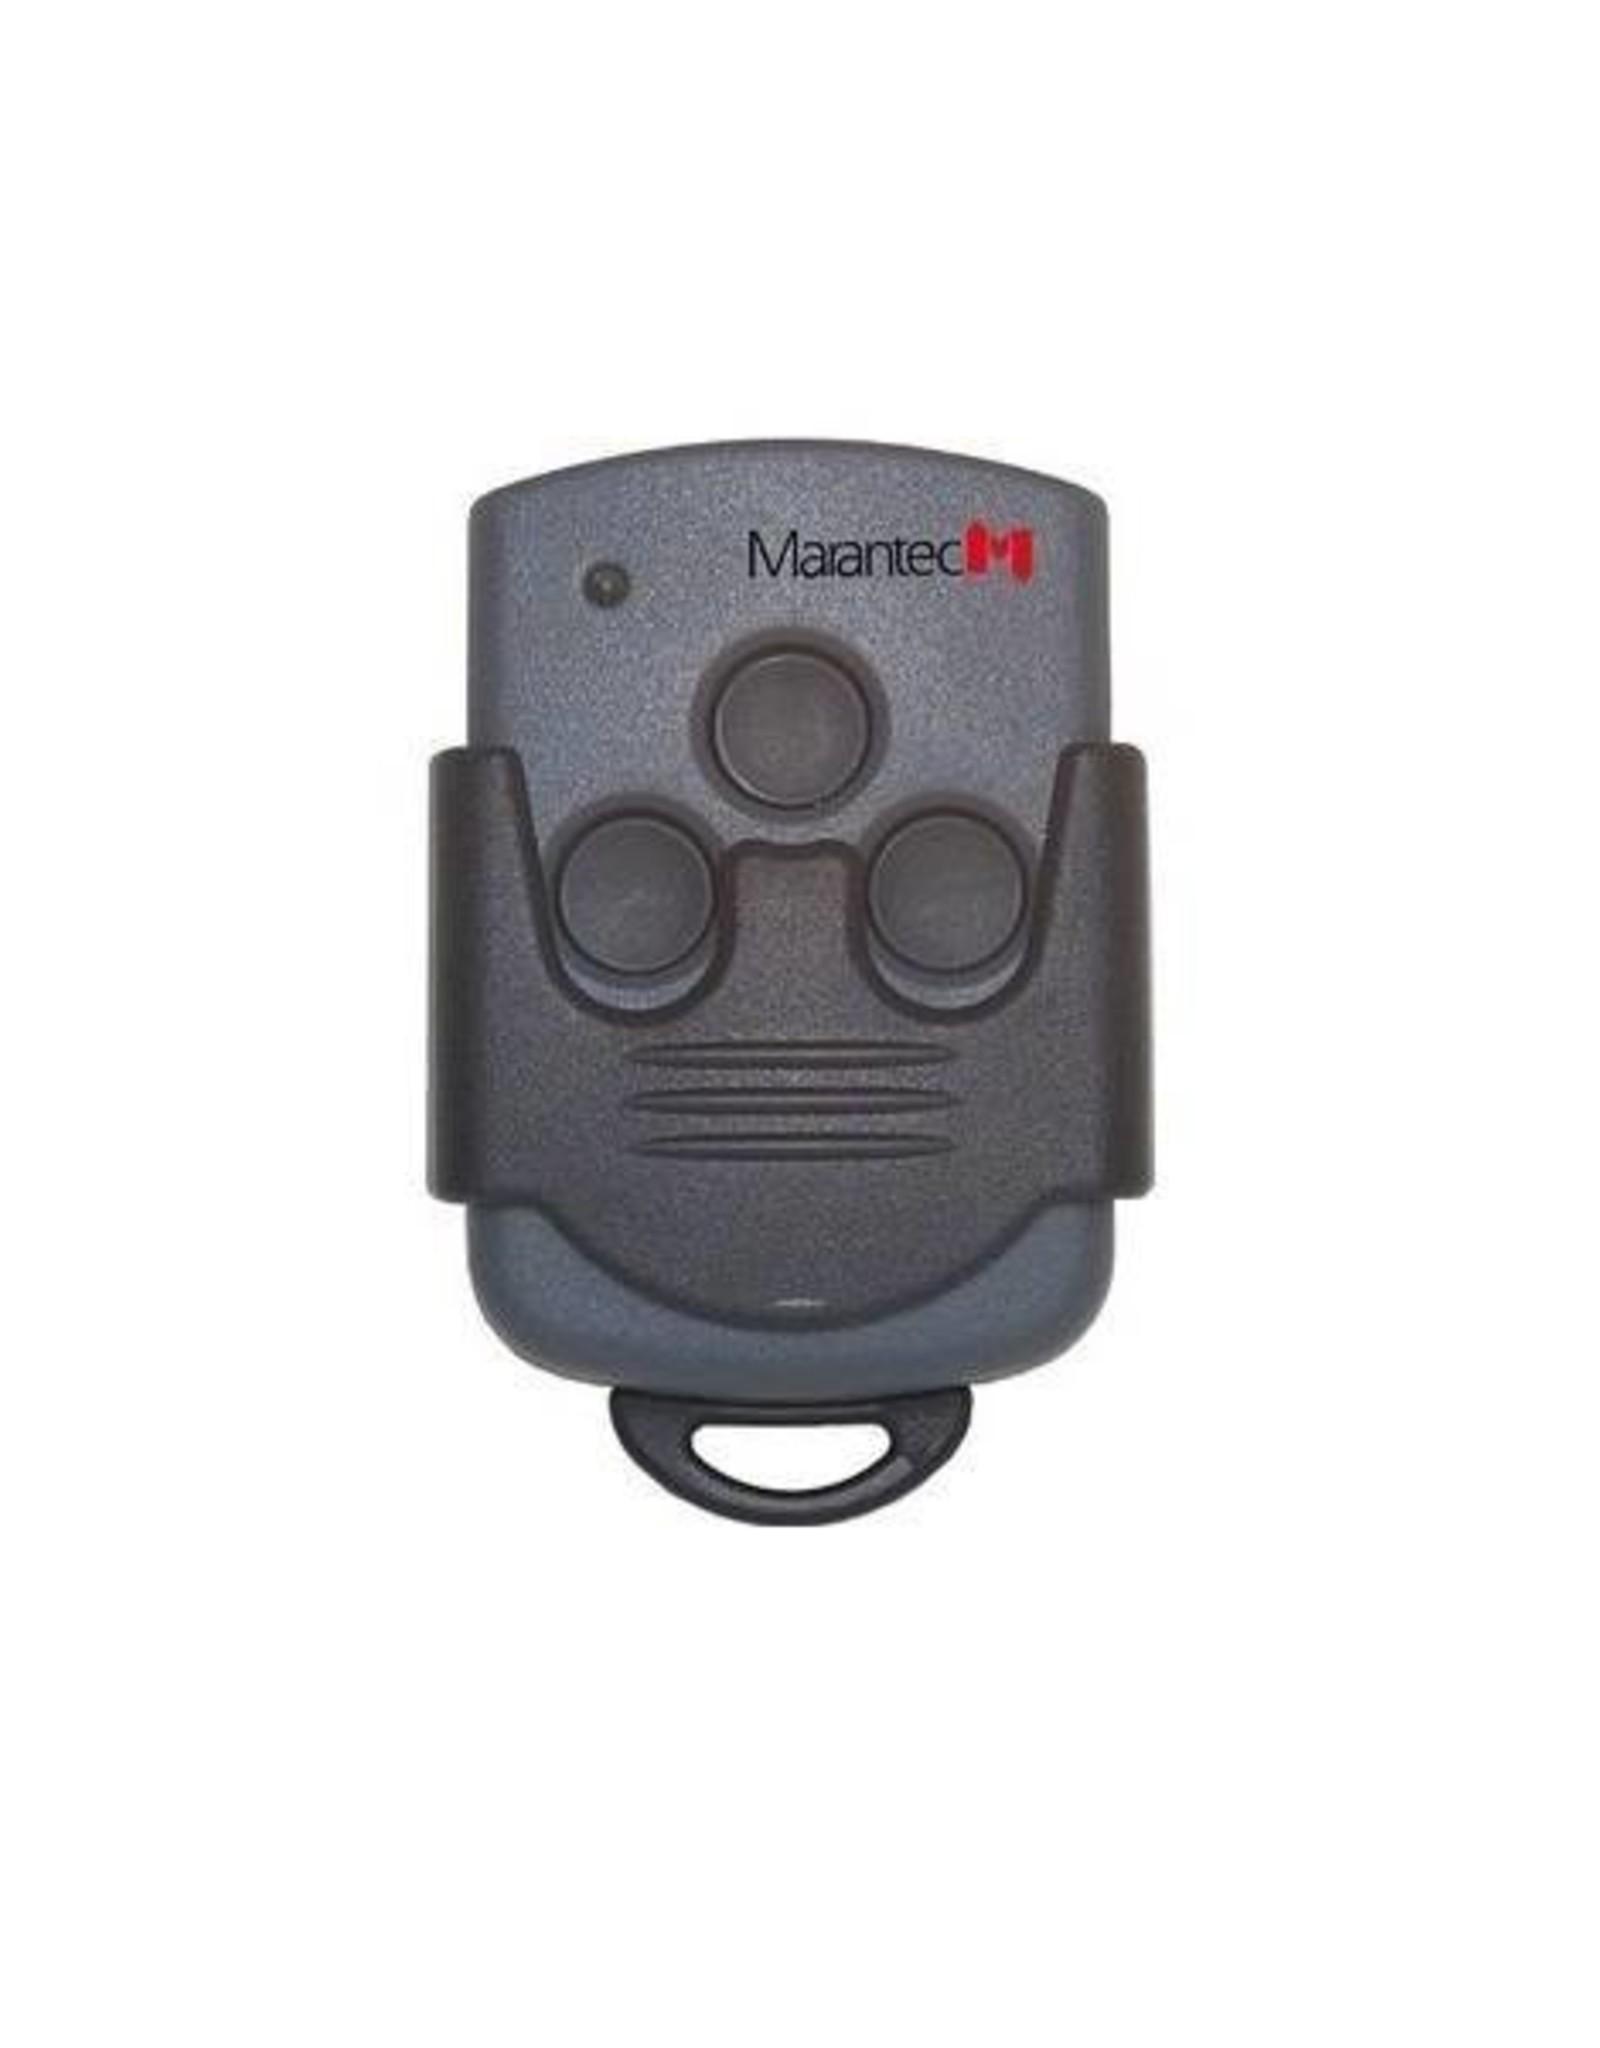 Marantec Marantec Digital 313 Multi-bit 433 MHz - 3 kanaals micro handzender